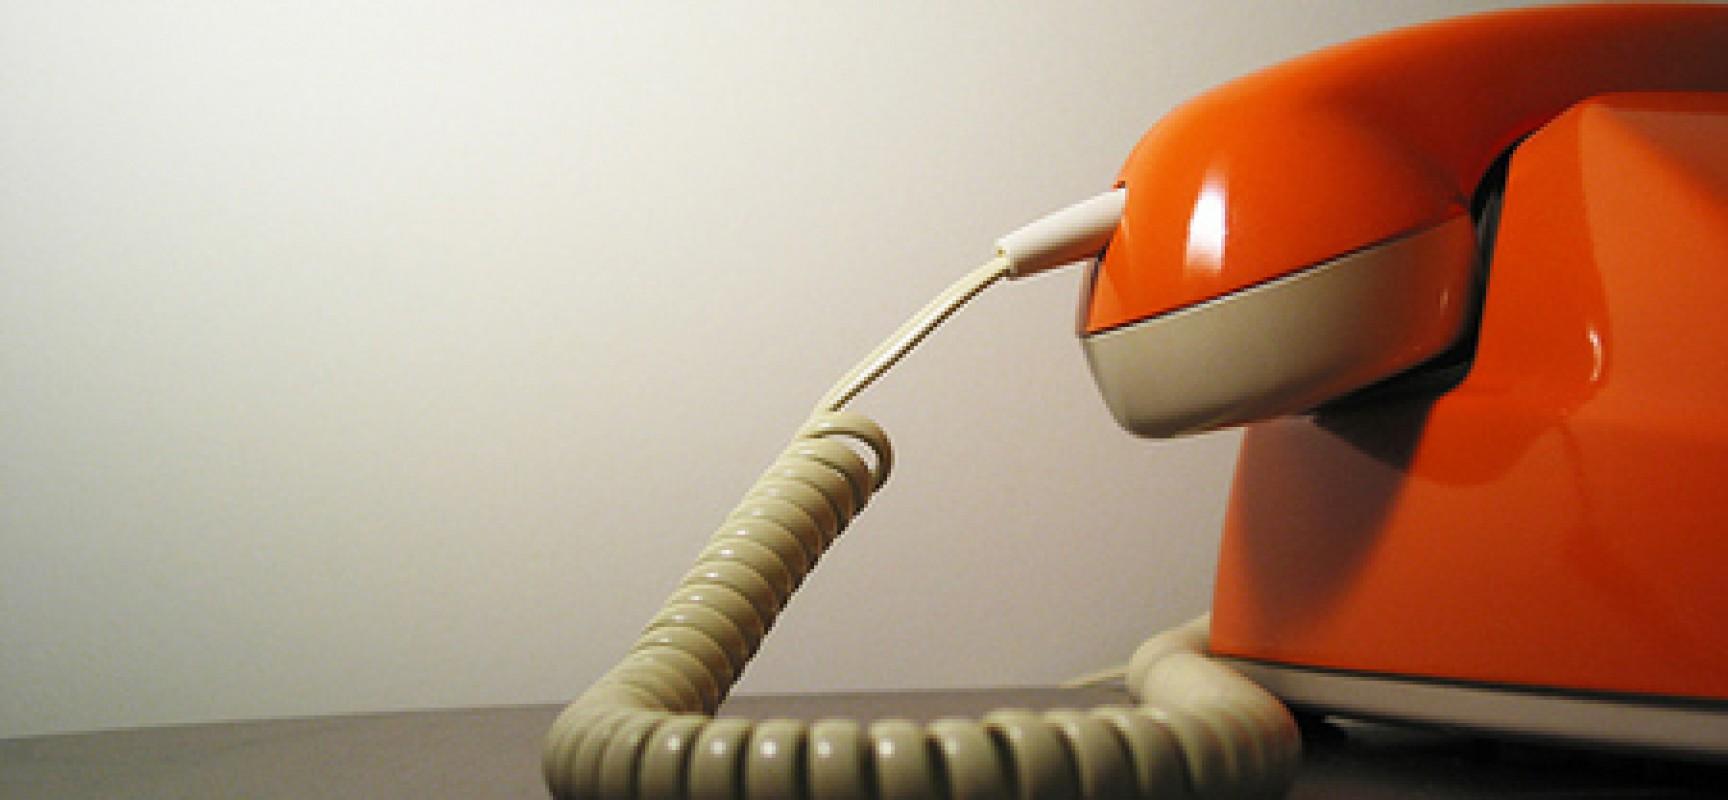 Telefono retrò arancione